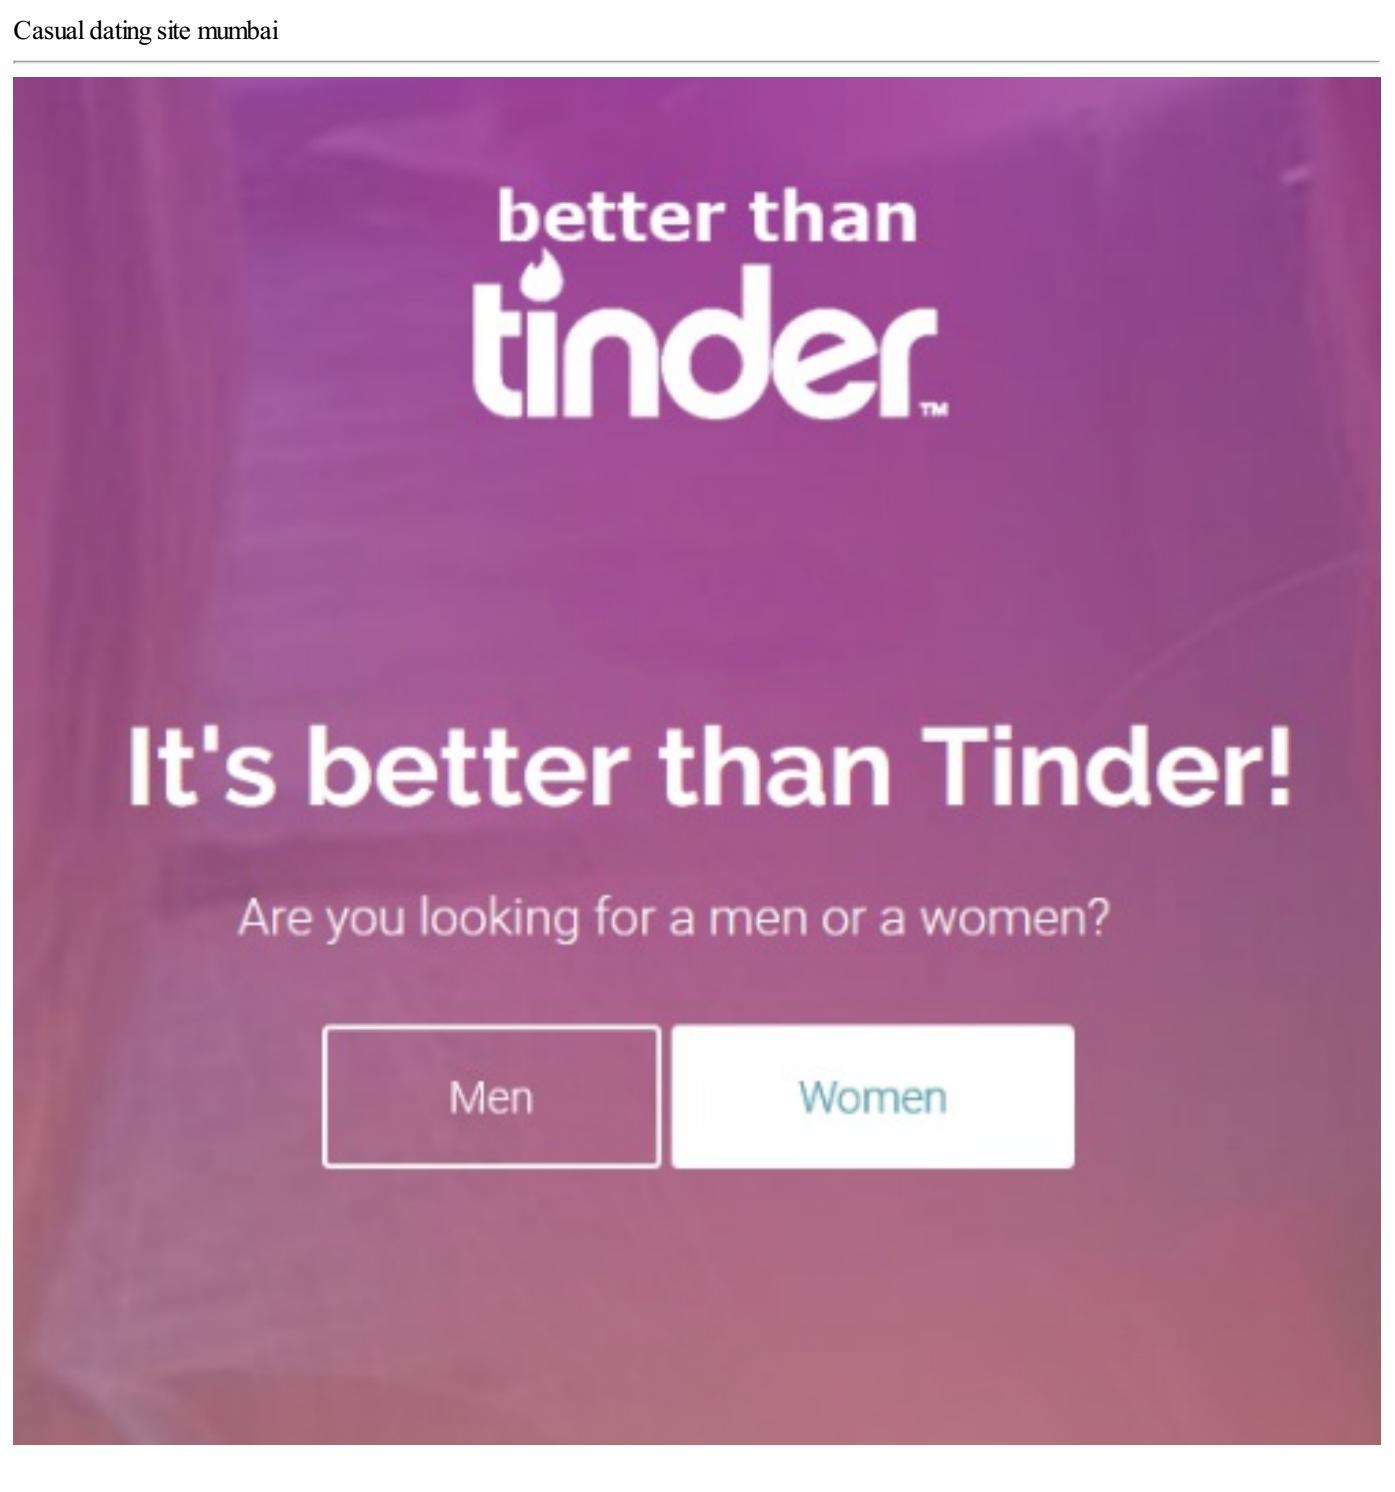 dating hjemmeside mumbai